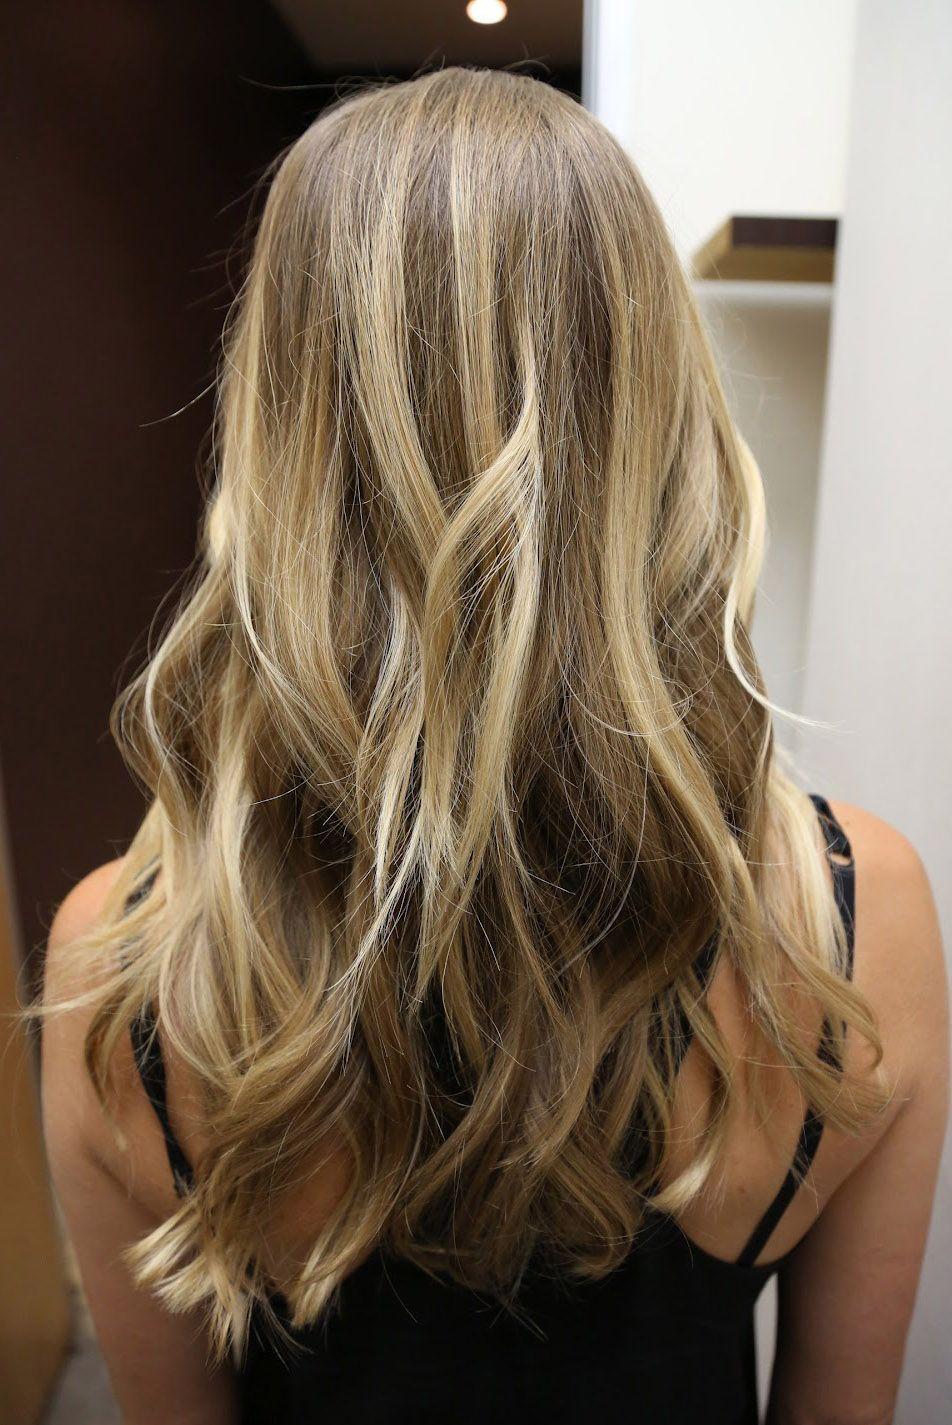 Going Blonde / Blonde Hair Tips